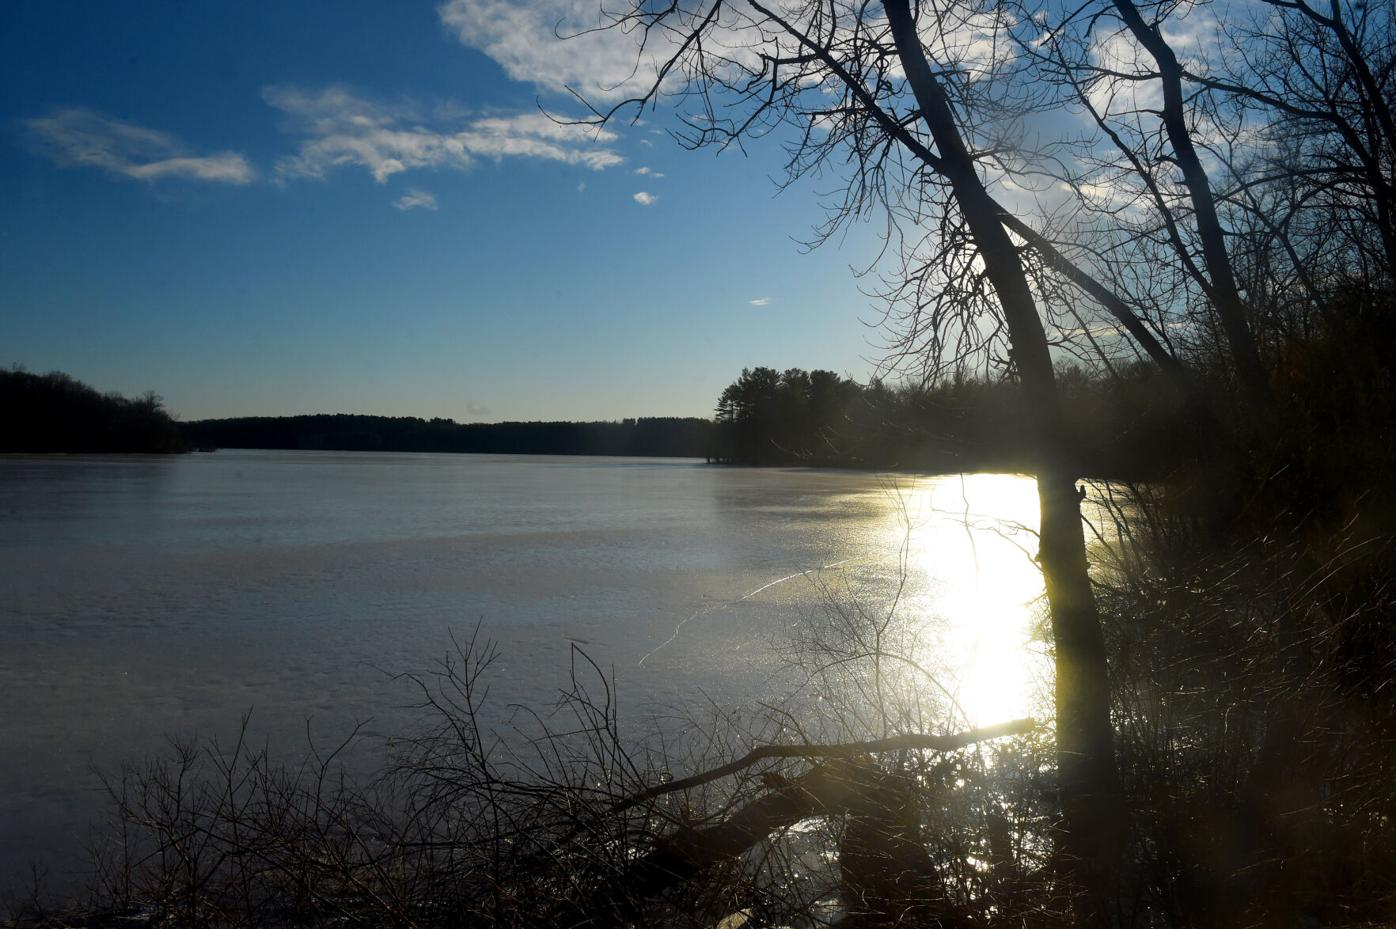 030421 TO Frozen Shenipsit Lake 03.jpg